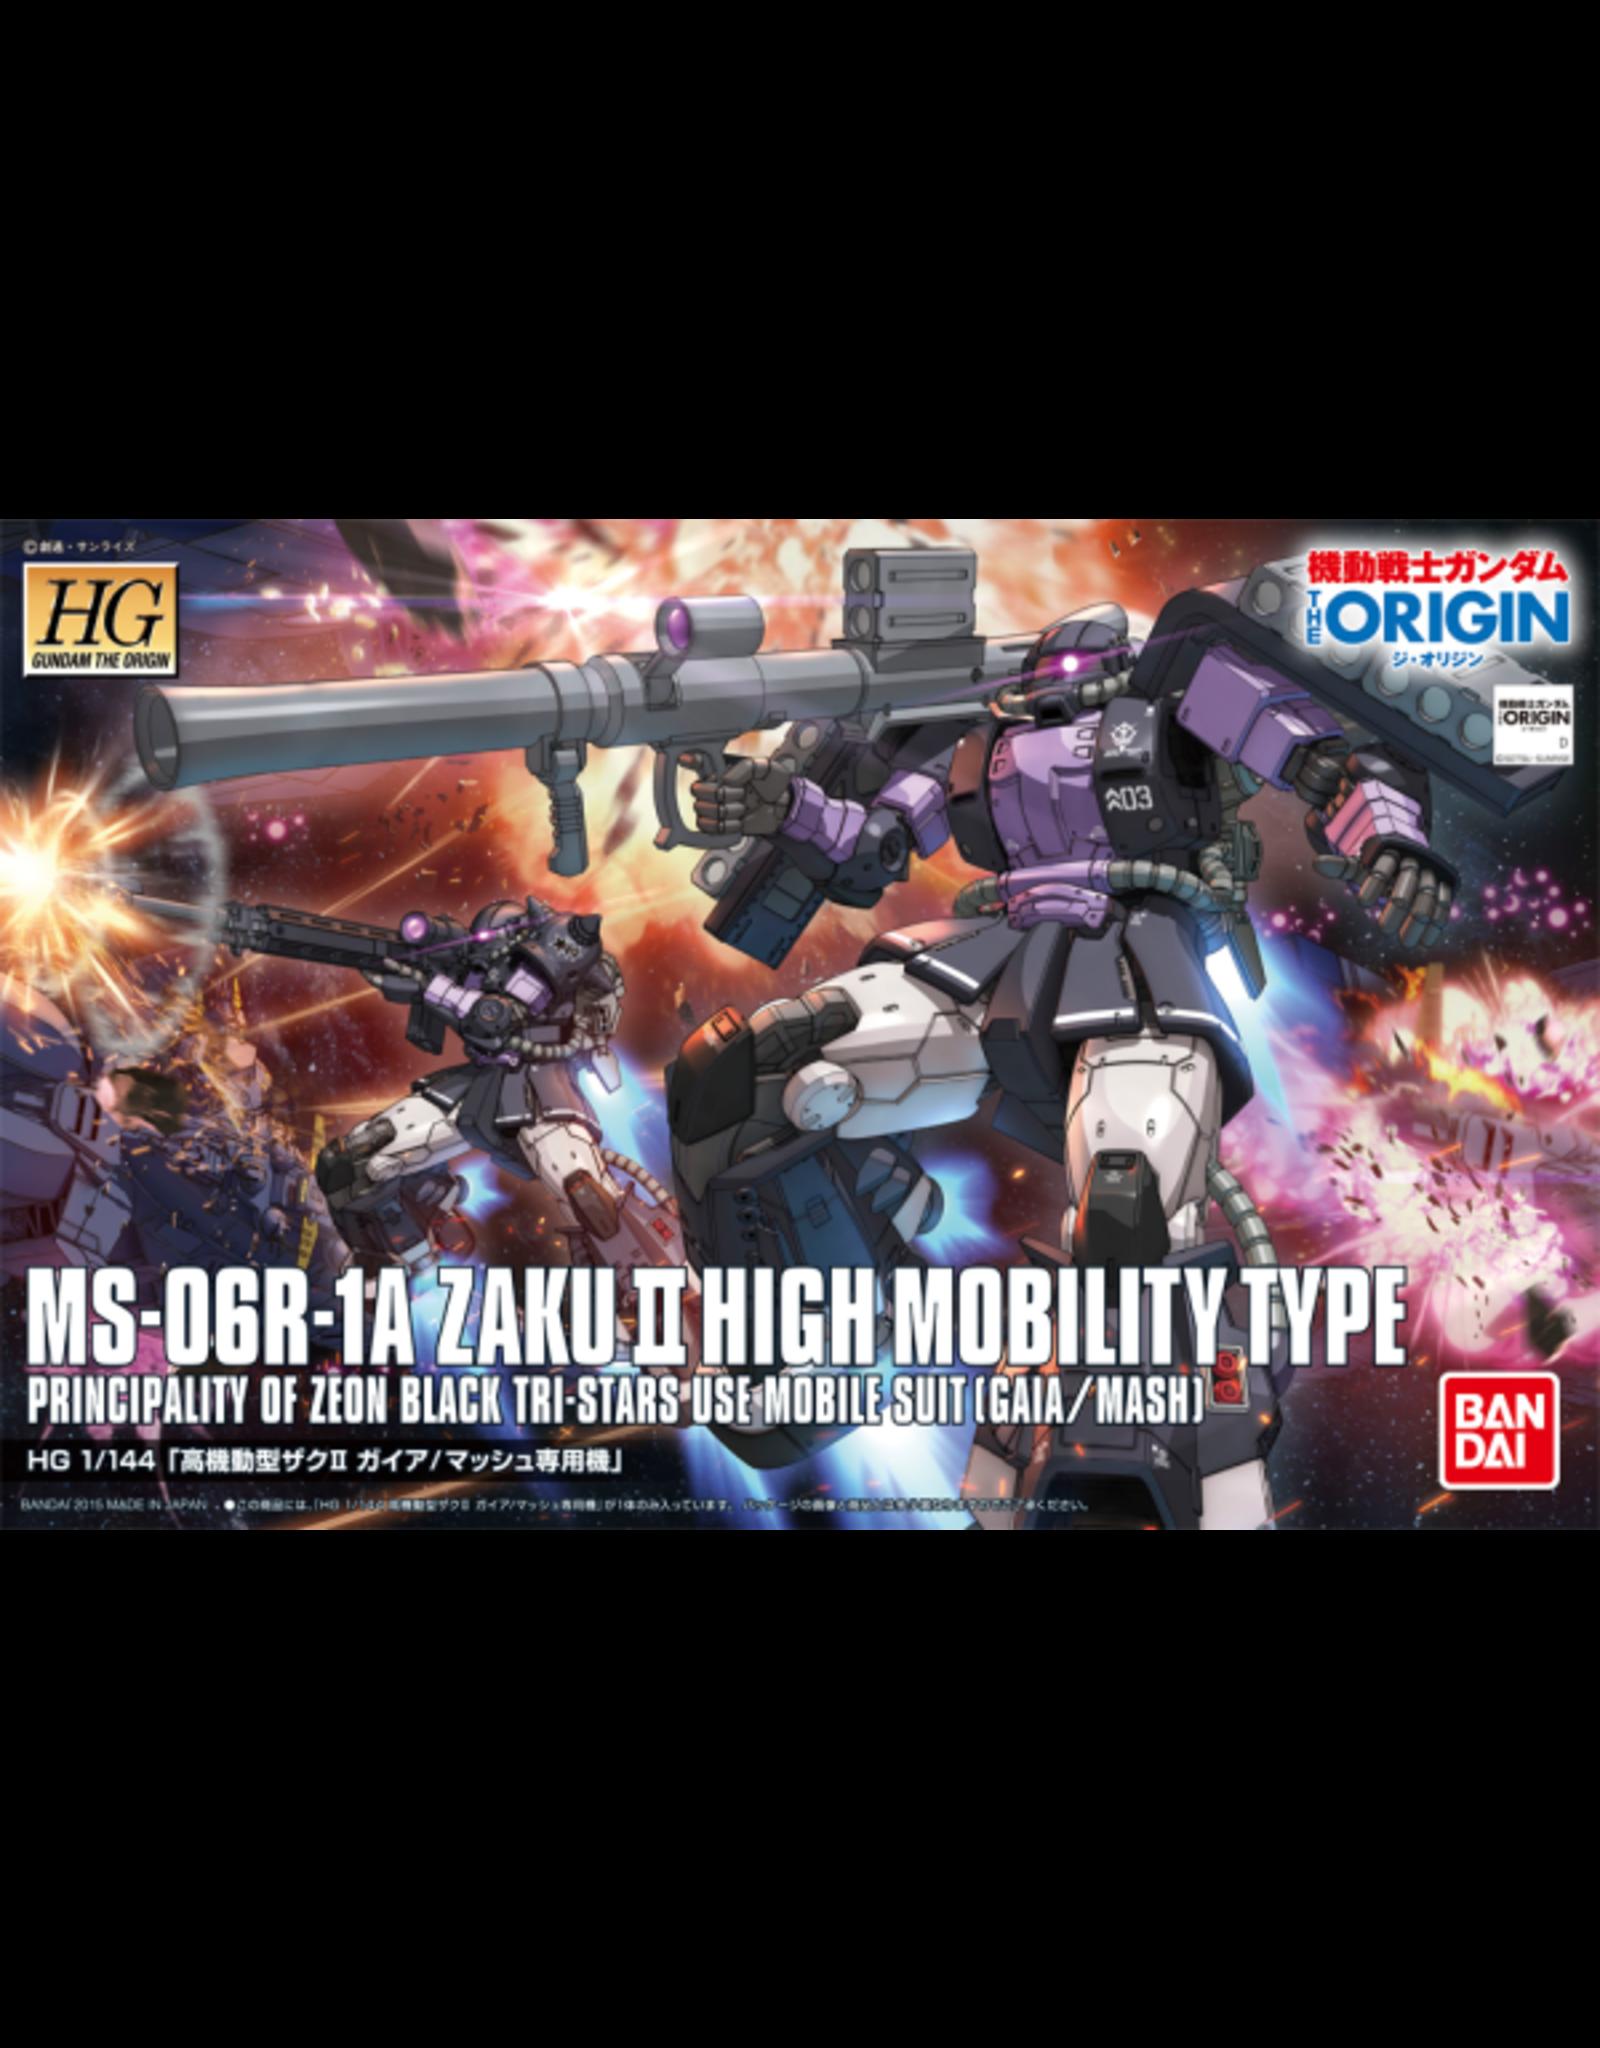 BANDAI 1/144 HGOG Zaku II High Mobility Type Gaia / Mash